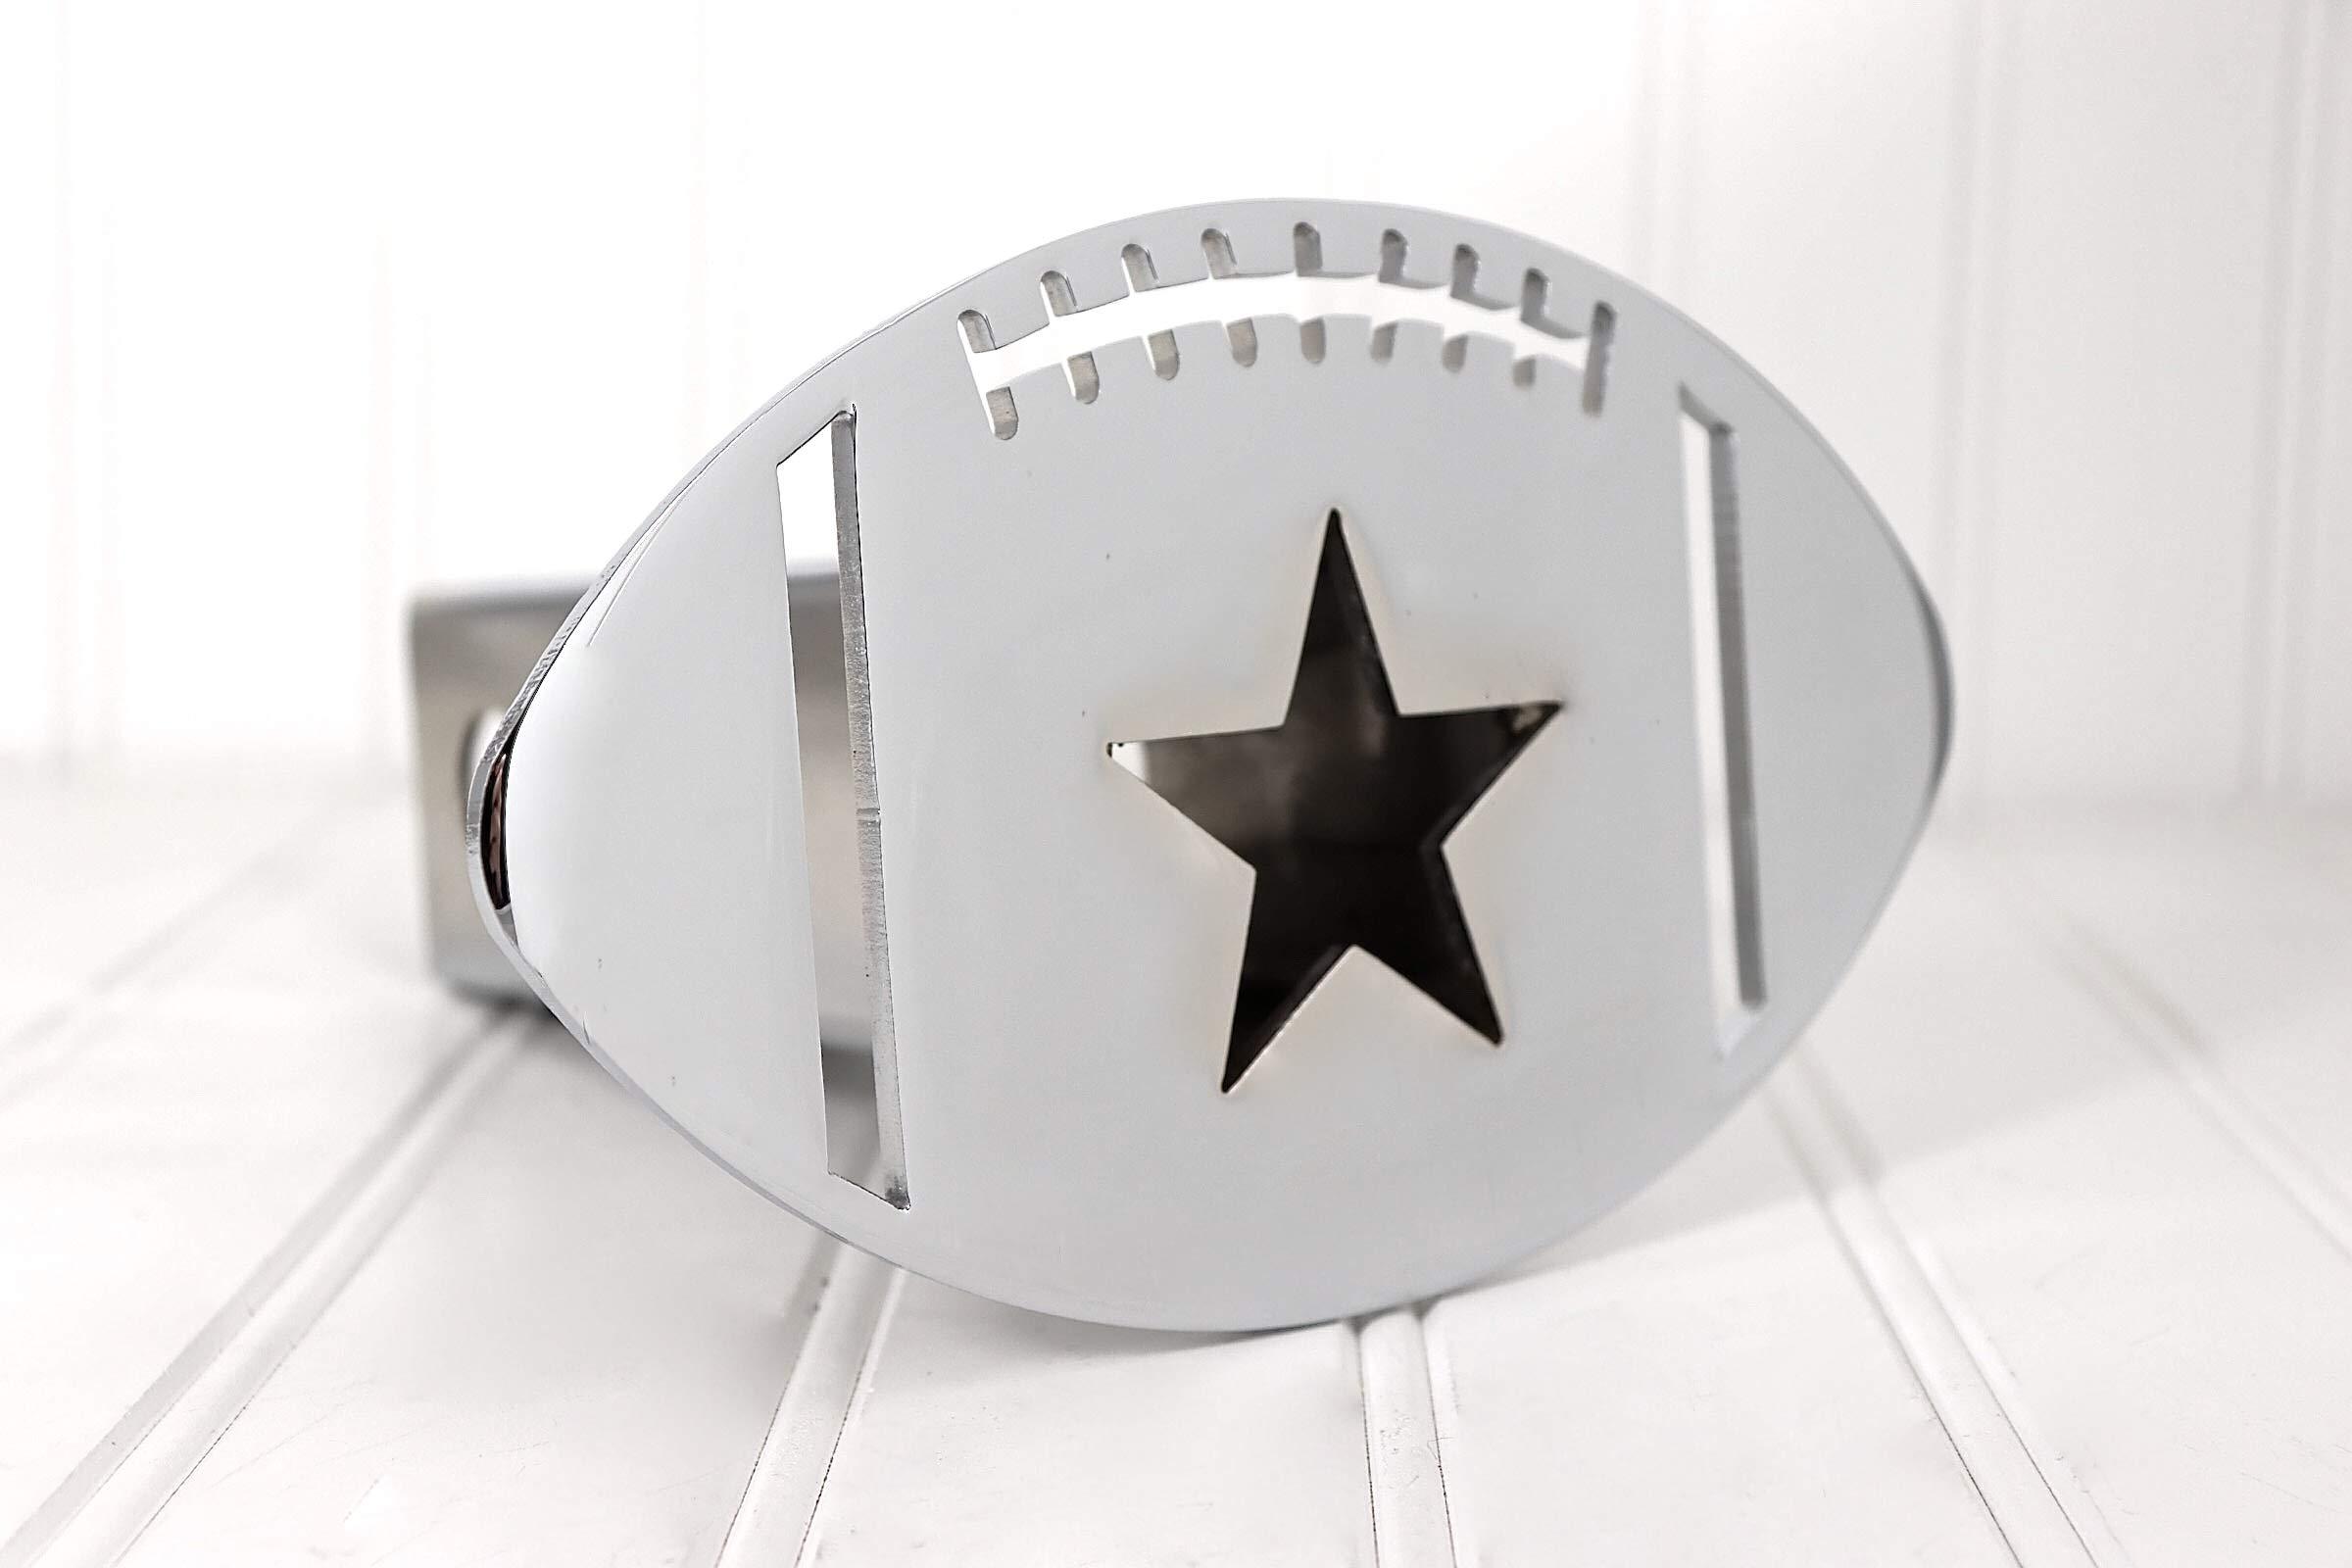 Custom Hitch Covers 12037-Chrome Dallas Cowboys Football Star Hitch Cover by Custom Hitch Covers